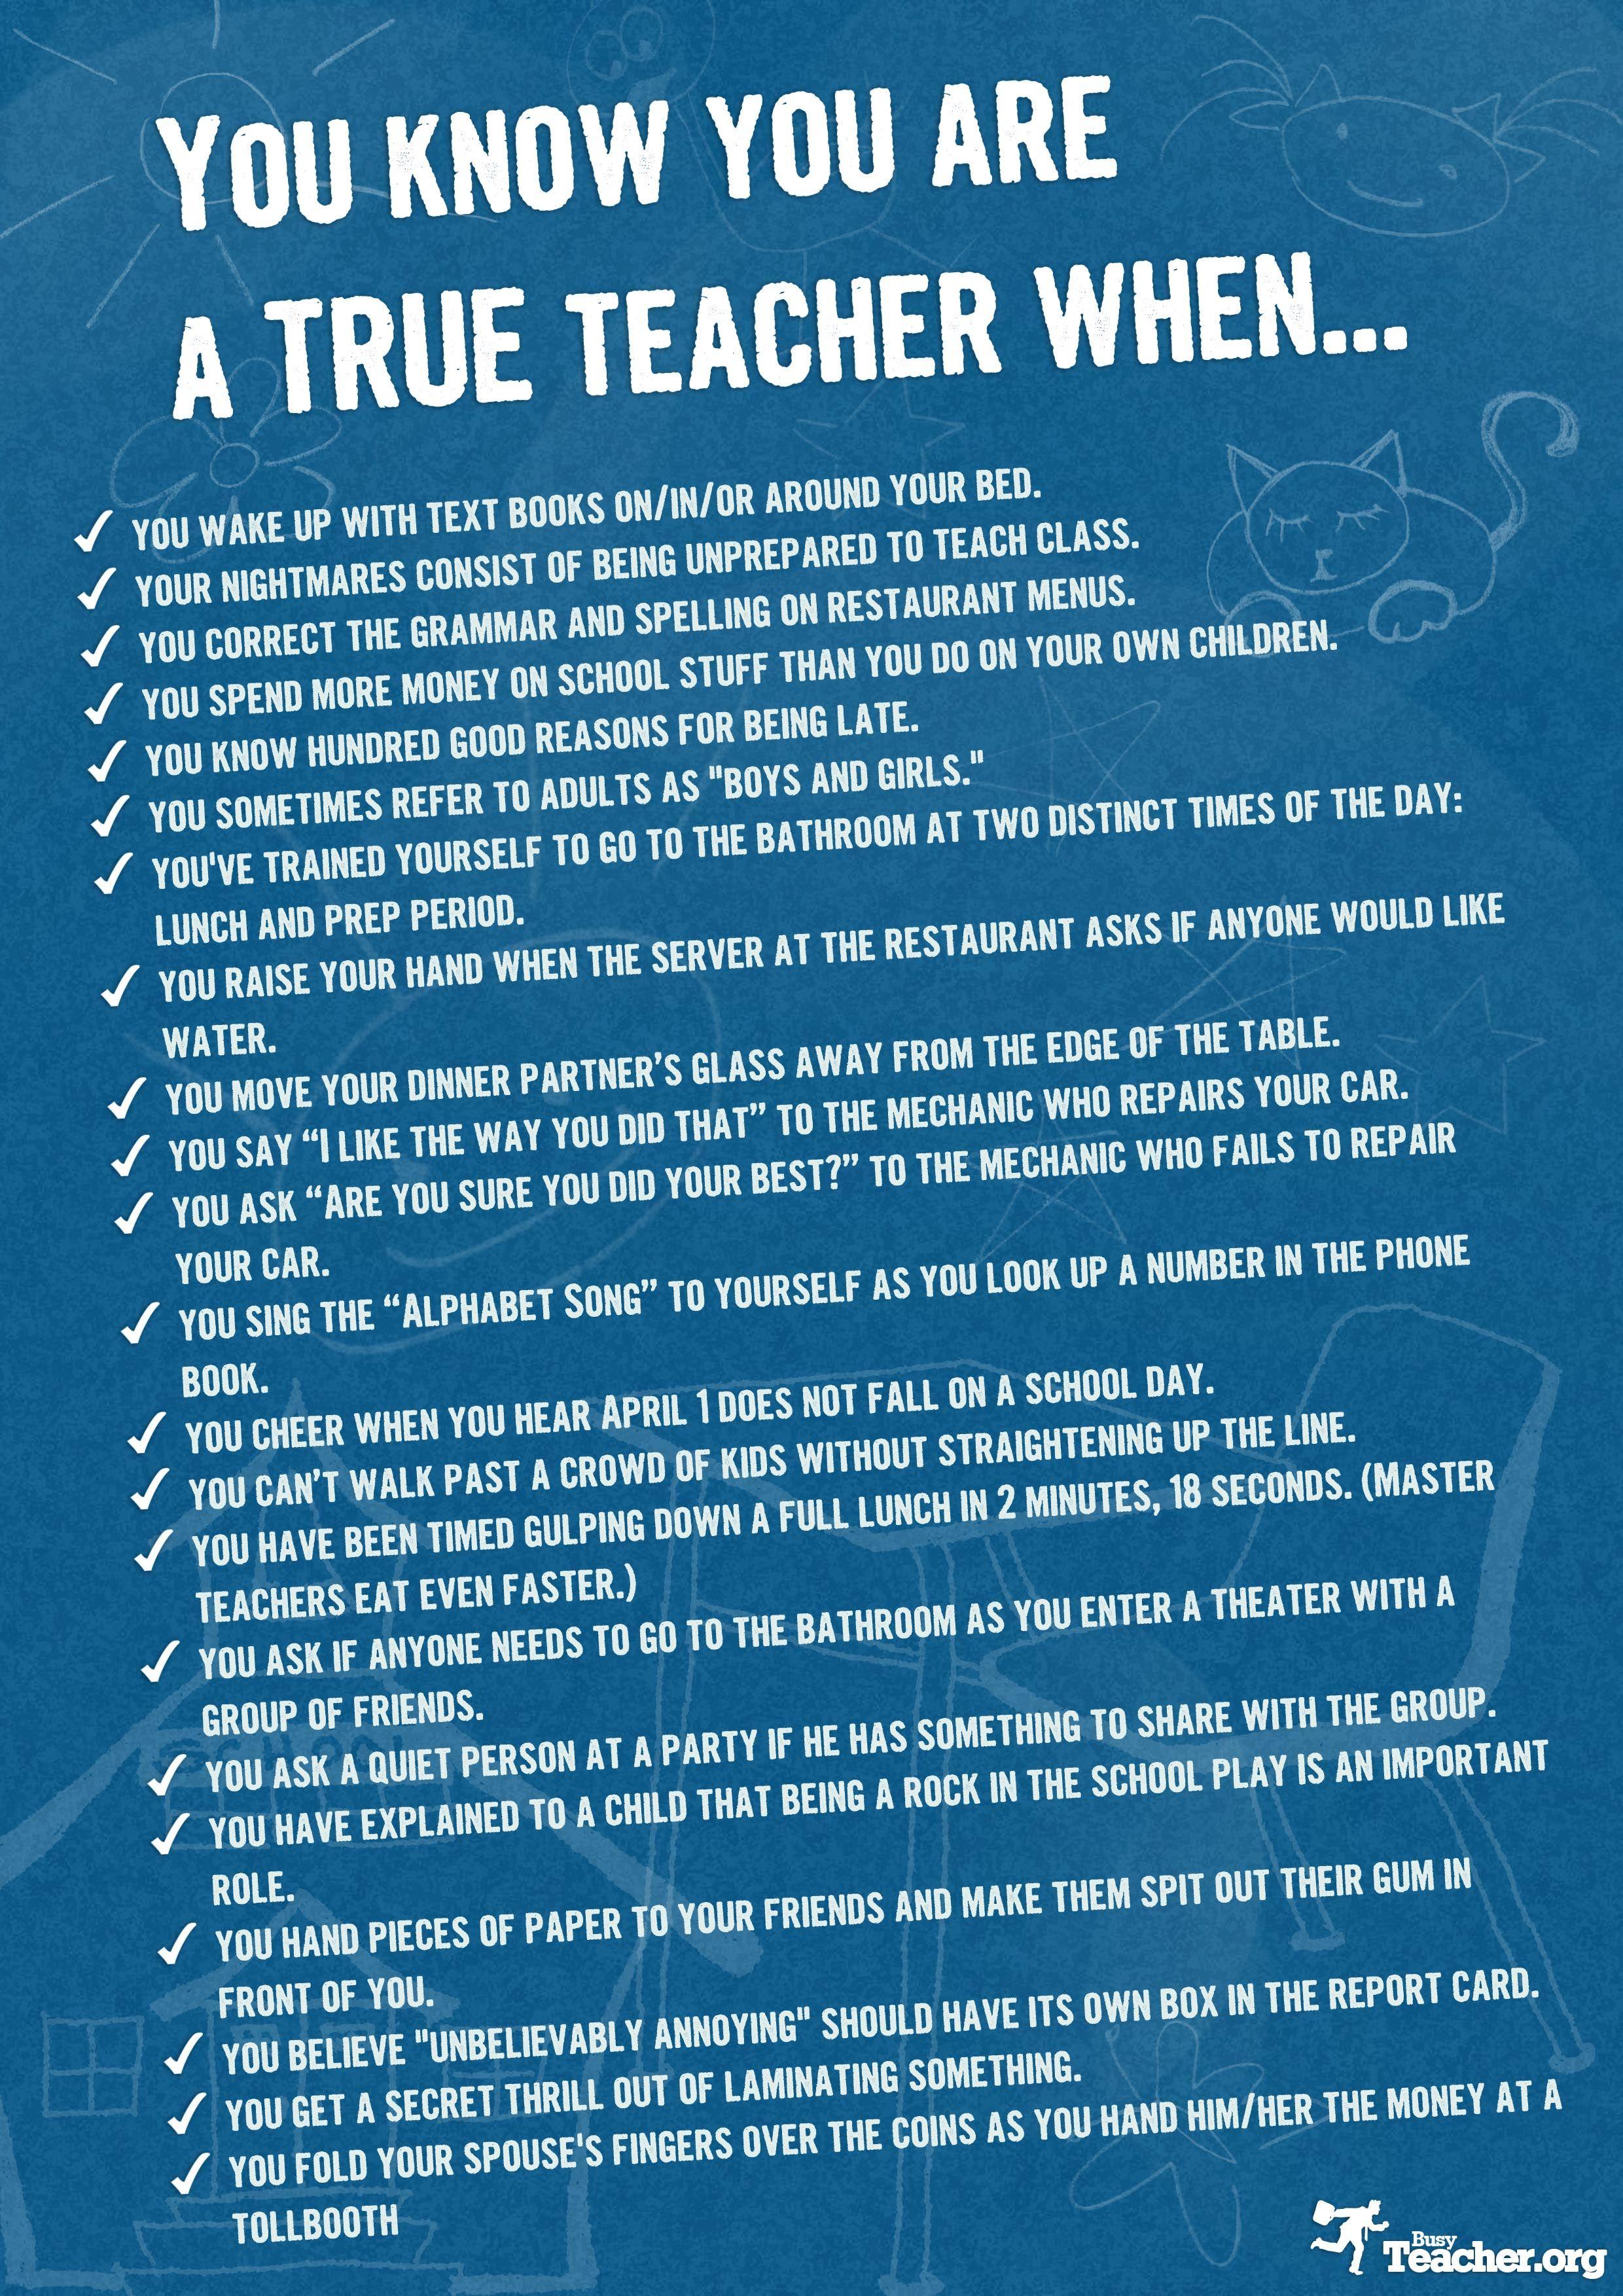 Teacher's Room Poster: You Know You're A TRUE Teacher When ...